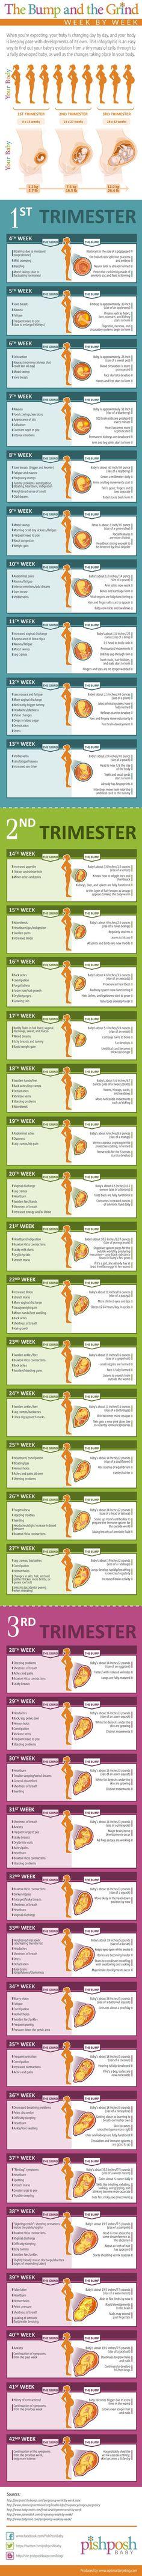 Pregnancy Week by Week Chart - Fun - - Schwanger - Pregnant Tips Doula, Pregnancy Chart, Pregnancy Info, Pregnancy Weeks, Pregnancy Timeline, Pregnancy Trimester Chart, Pregnancy Health, Pregnancy Symptoms By Week, Pregnancy Facts